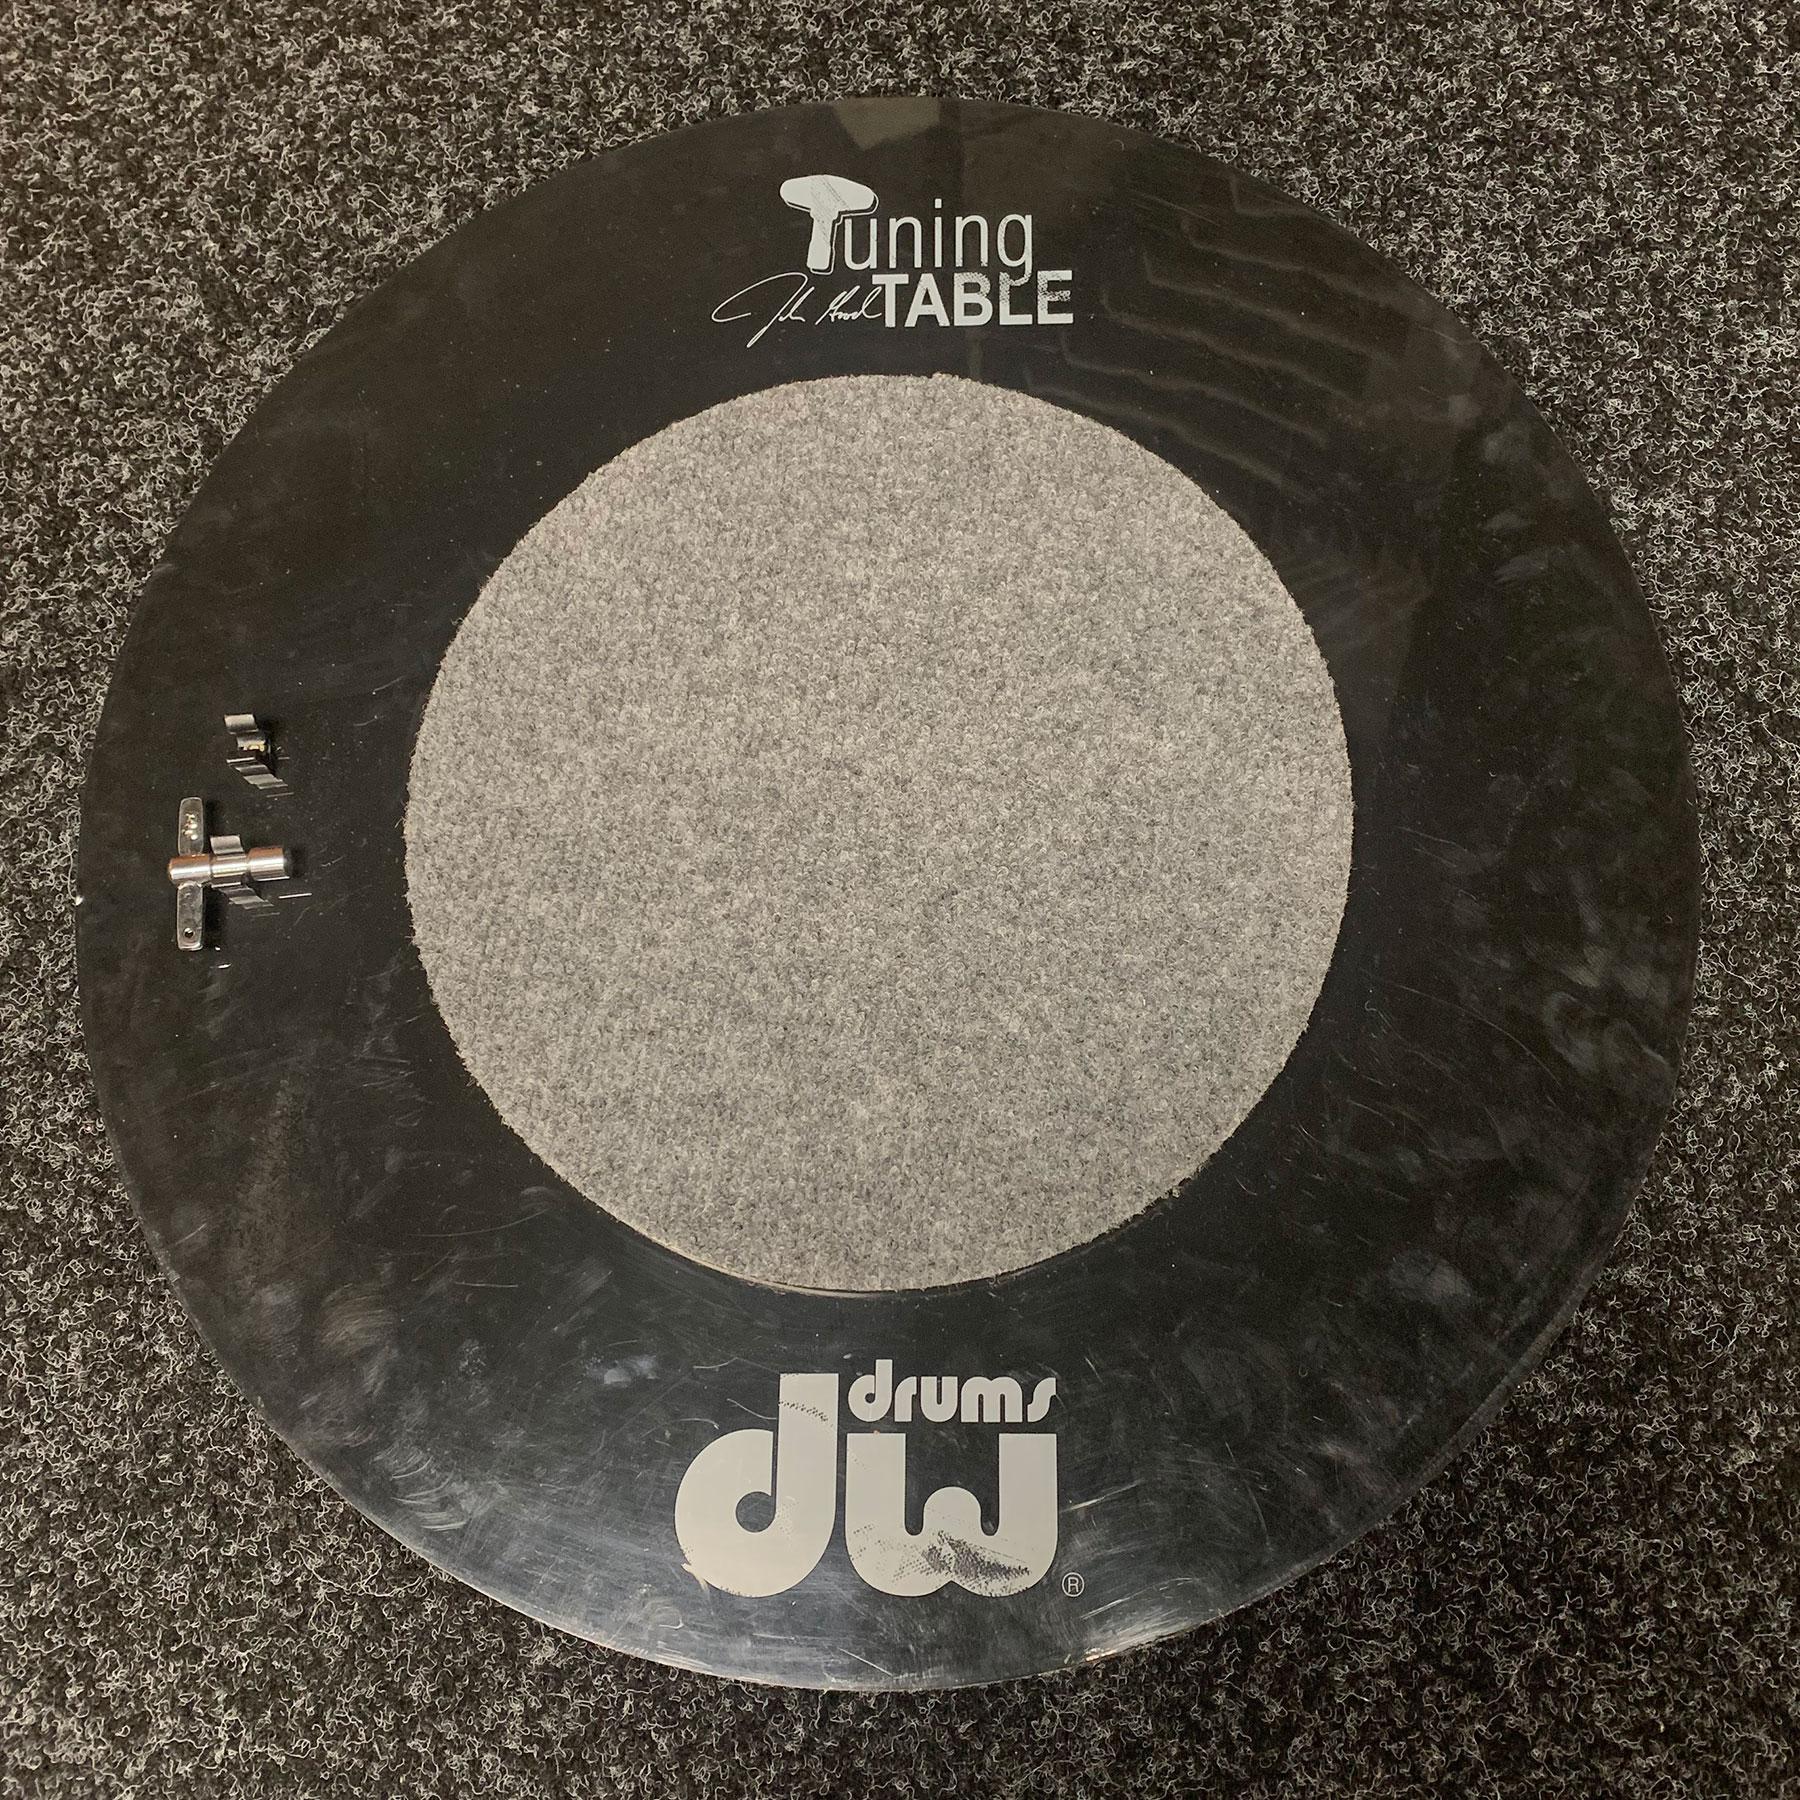 DW John Good Tuning Table - DWCPJGTBL - Pre-owned